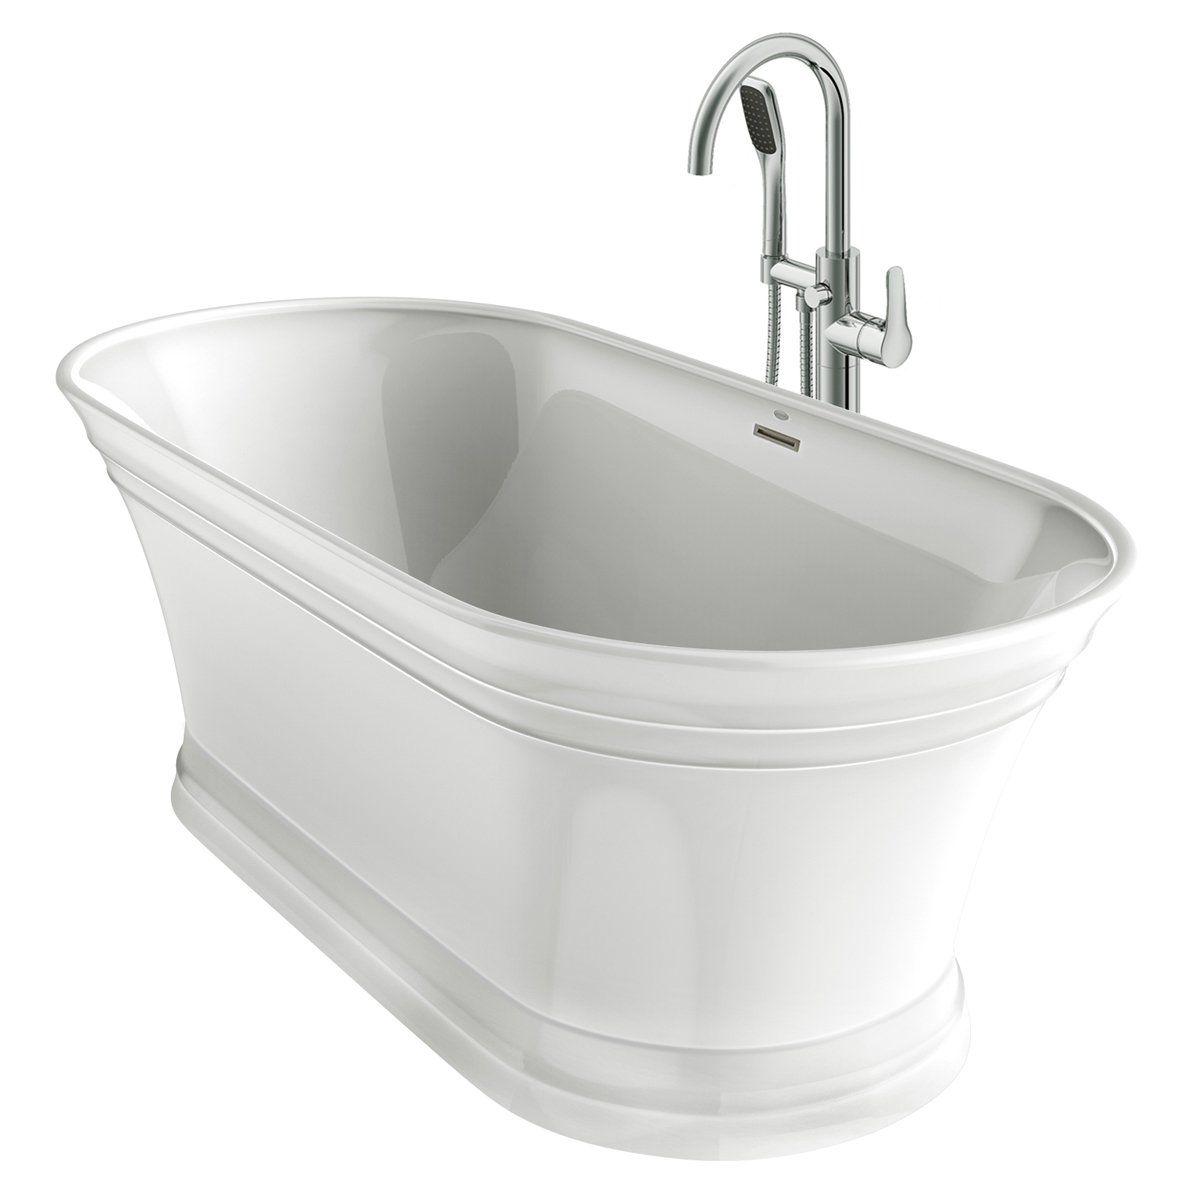 Lyndsay Freestanding Bath With Images Free Standing Bath Tub